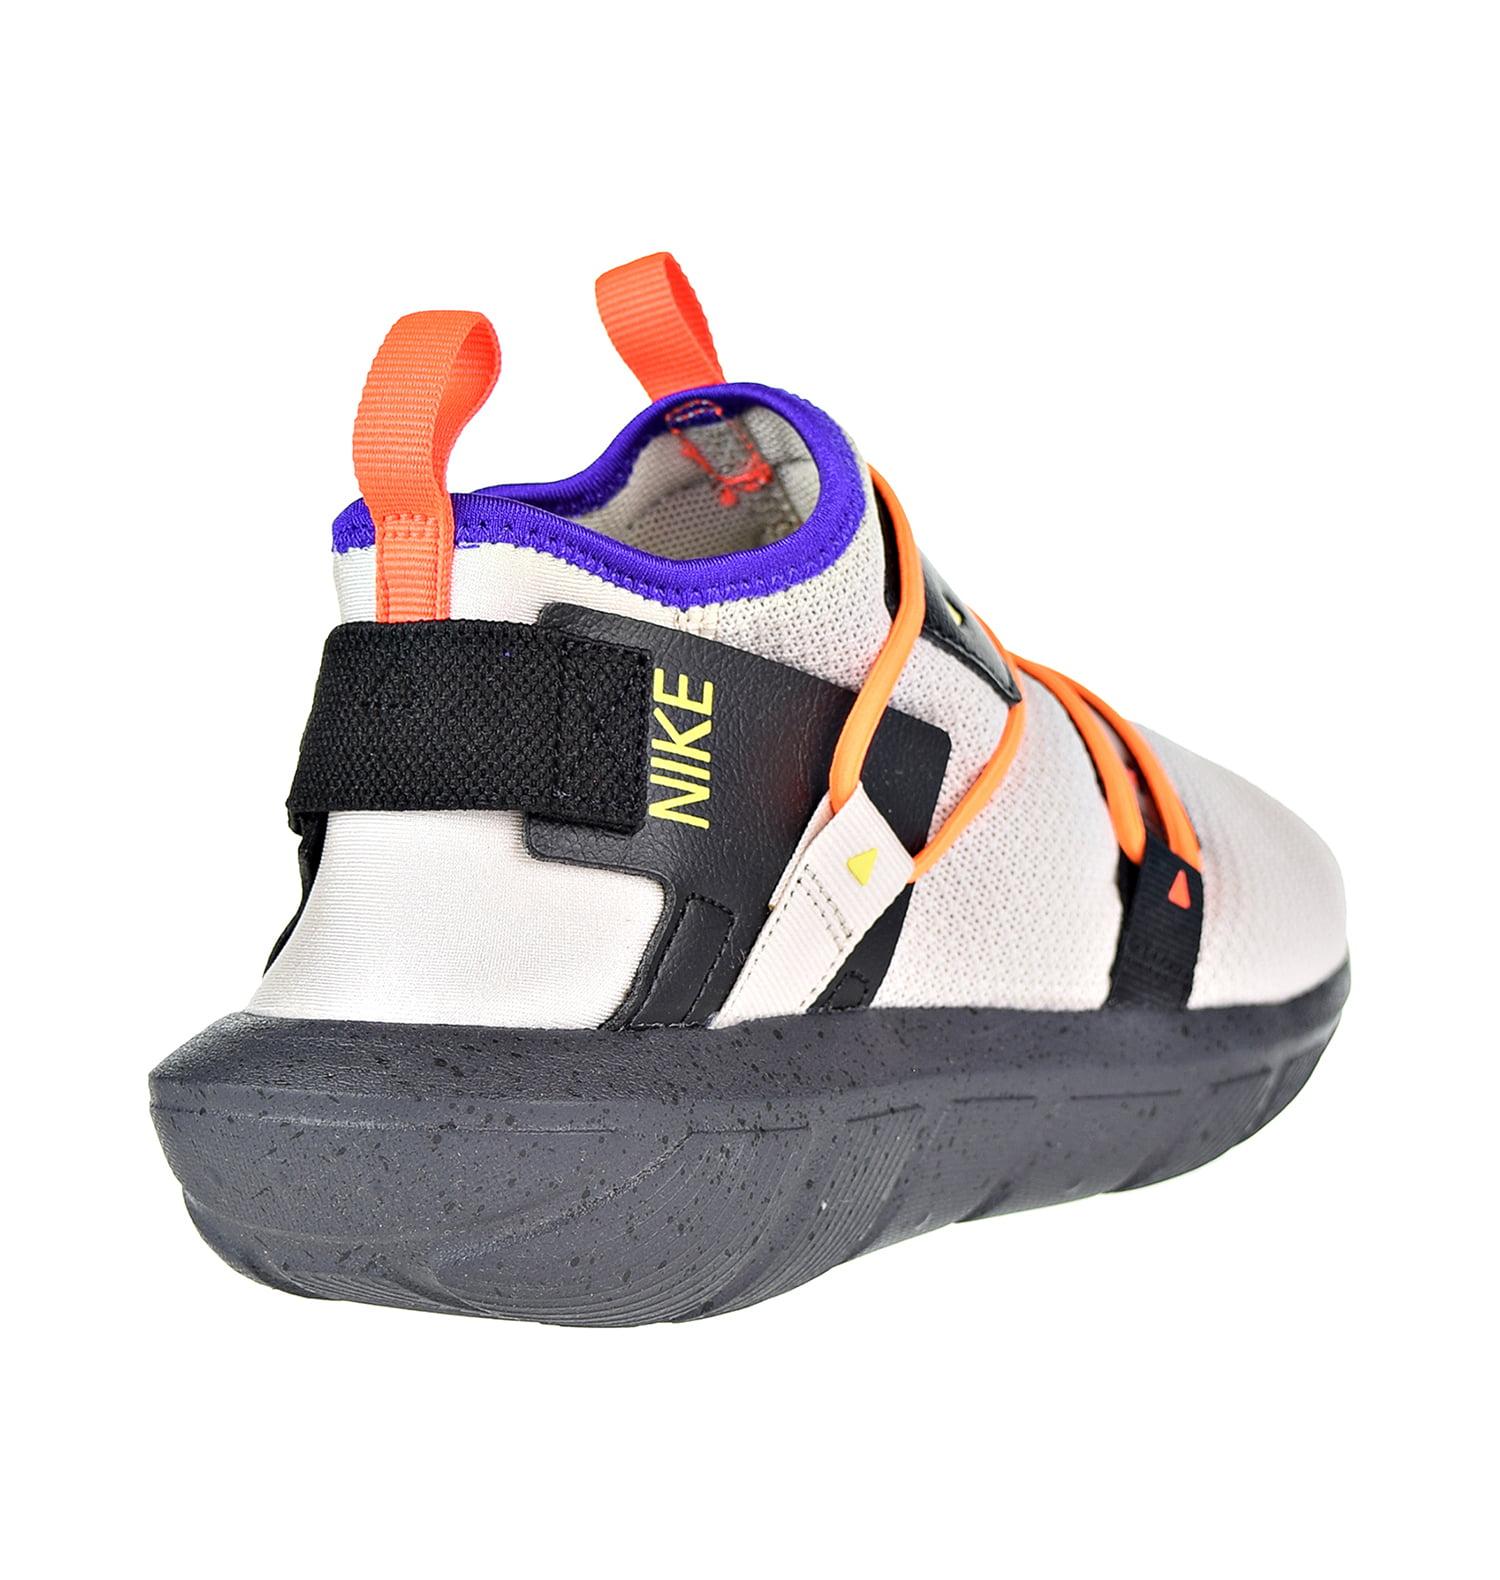 0d4d830490cf Nike - Nike Vortak Men s Shoes Desert Sand Orage Black aa2194-001 -  Walmart.com